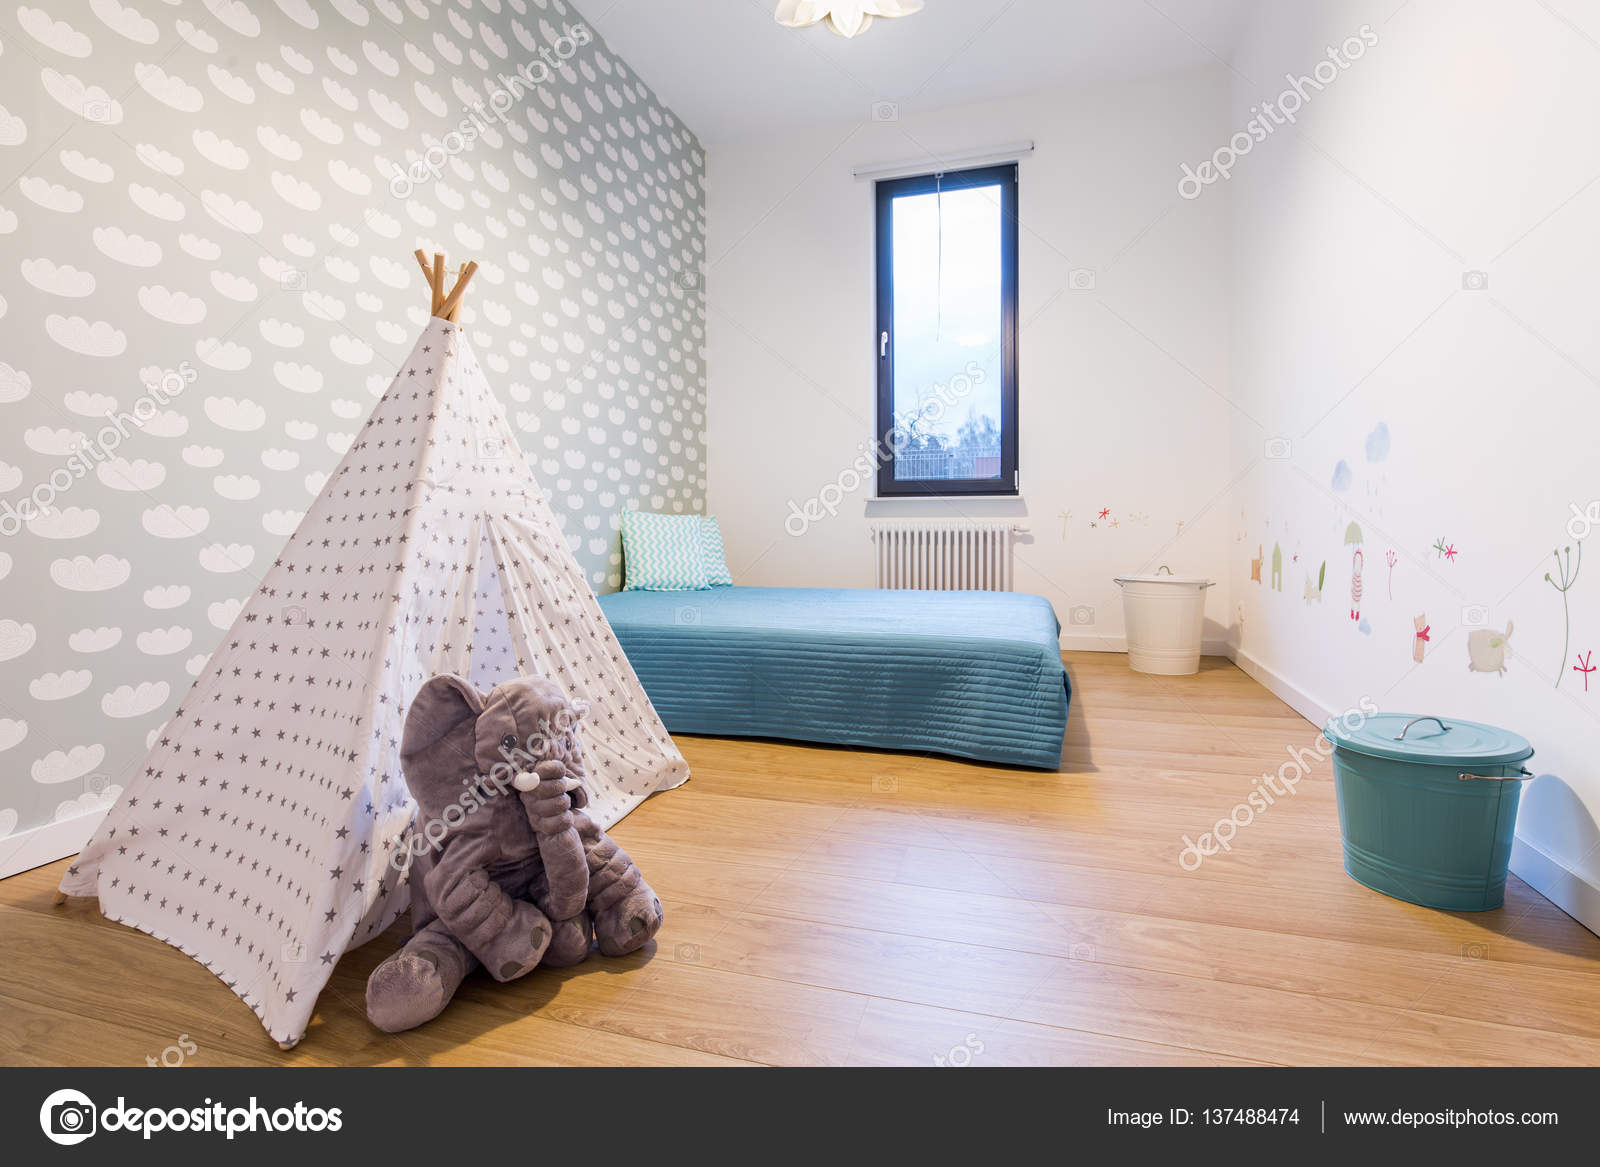 Tipi Tent Kinderkamer : Kinderkamer met tipi tent u stockfoto photographee eu